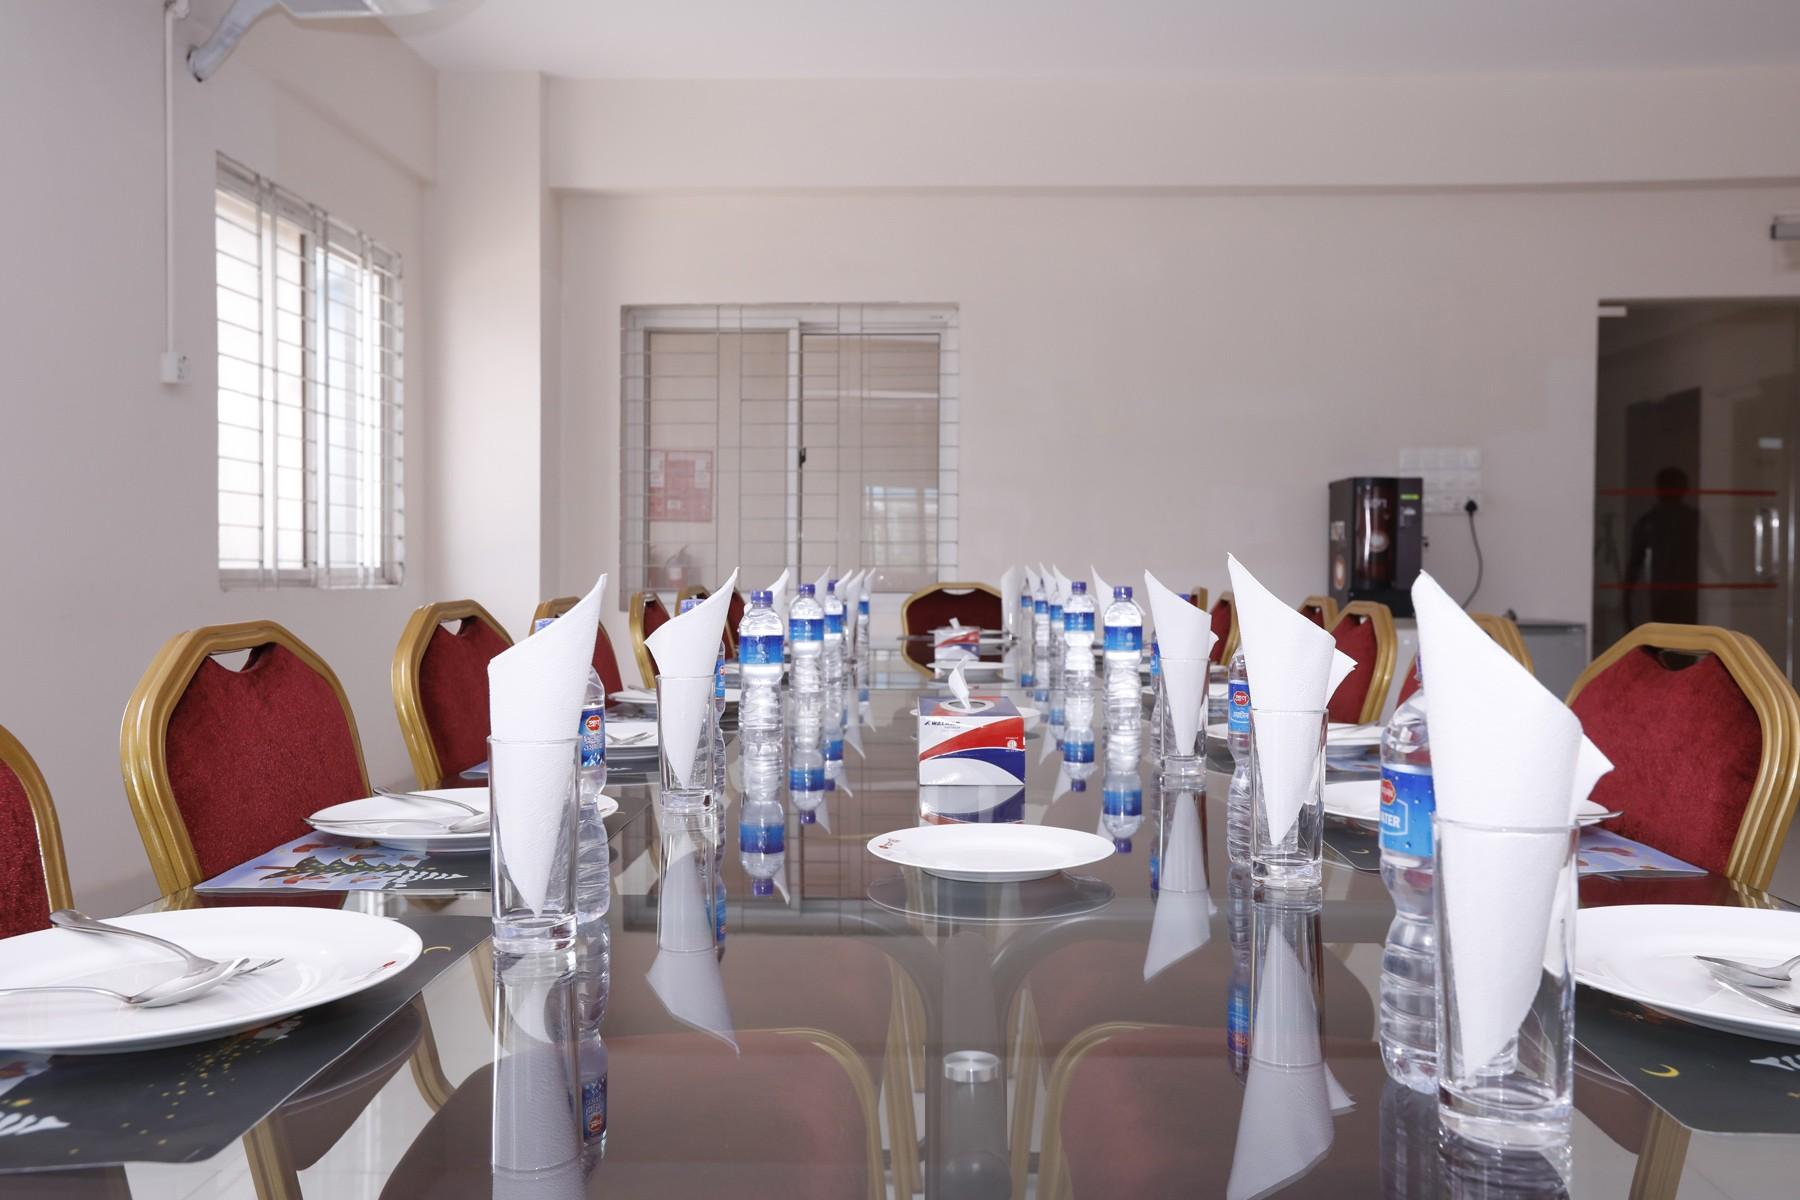 PIP Dinning Facilities